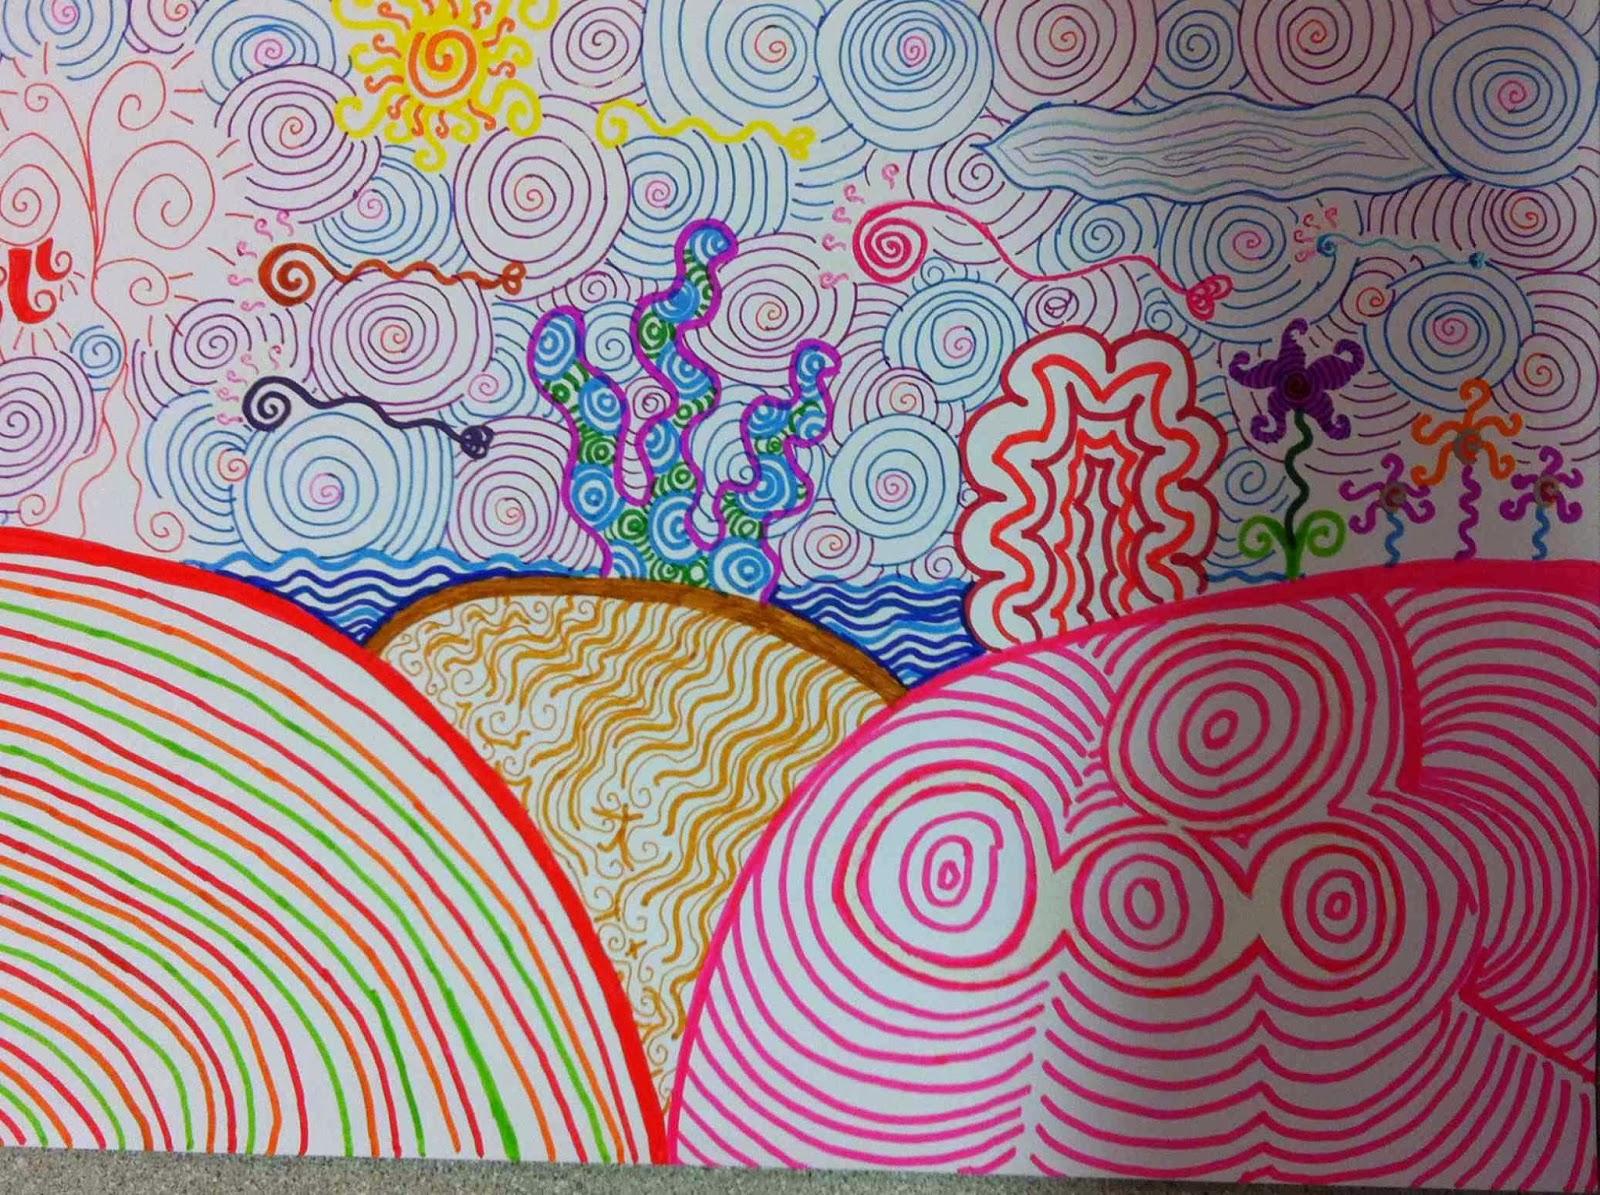 Dibujo De Lineas Paisaje: 2013/14 - LÍNEAS Paisaje Imaginario